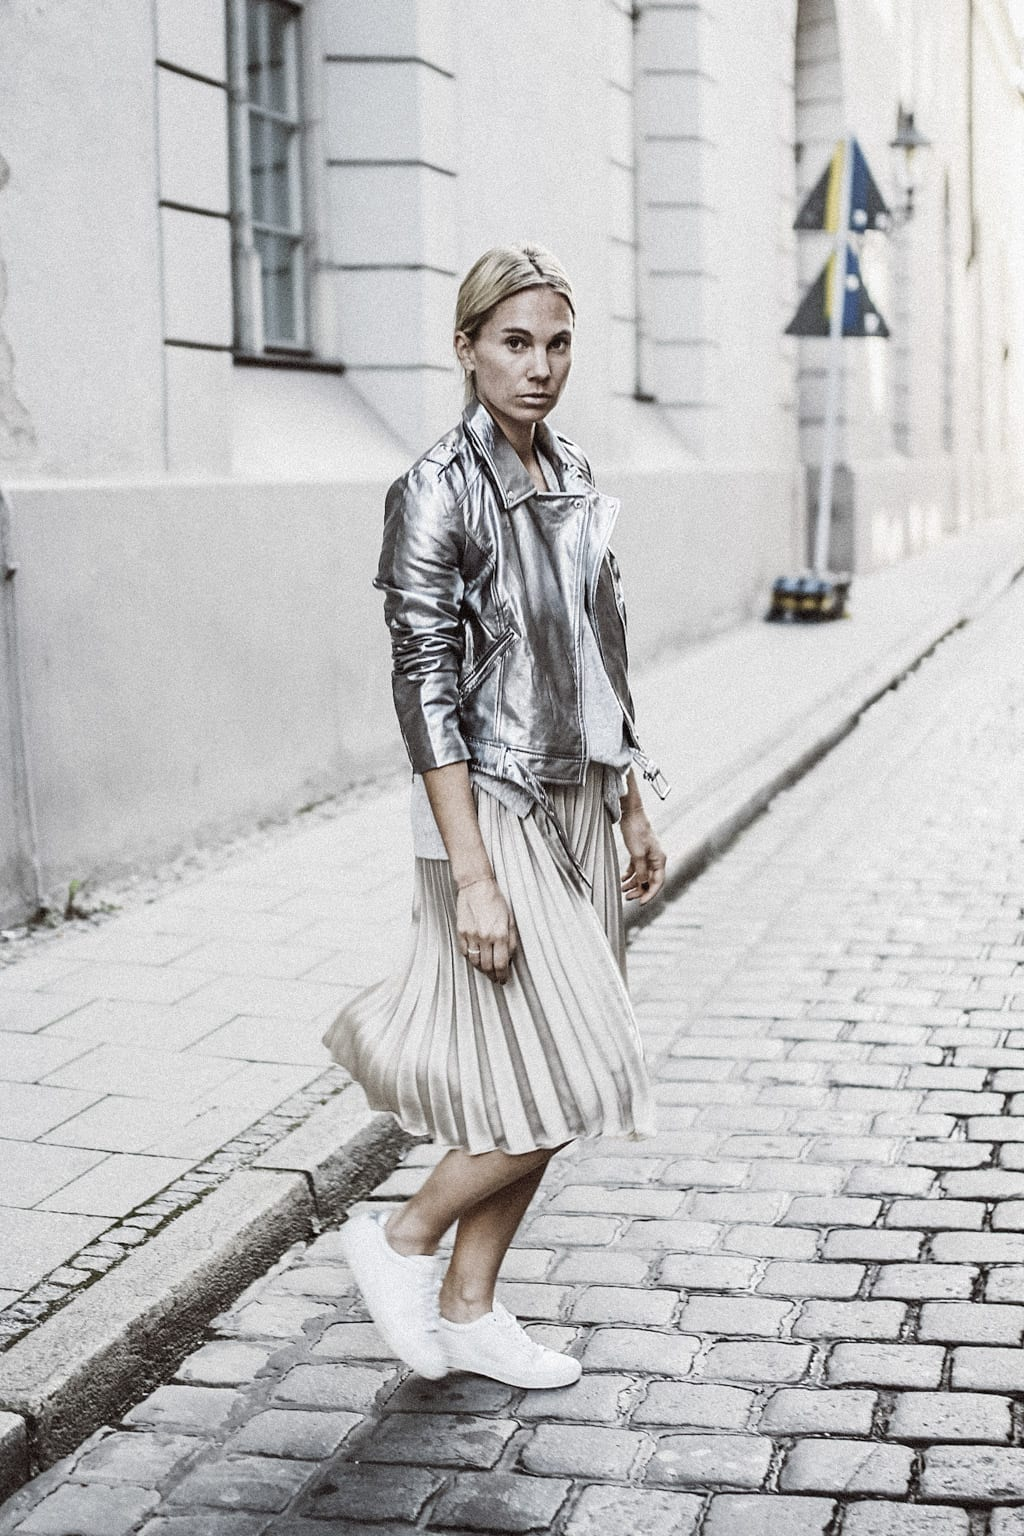 ck-constantlyk-com-karin-kaswurm-street-style-fashion-silver-leather-jacket-plissee-6978